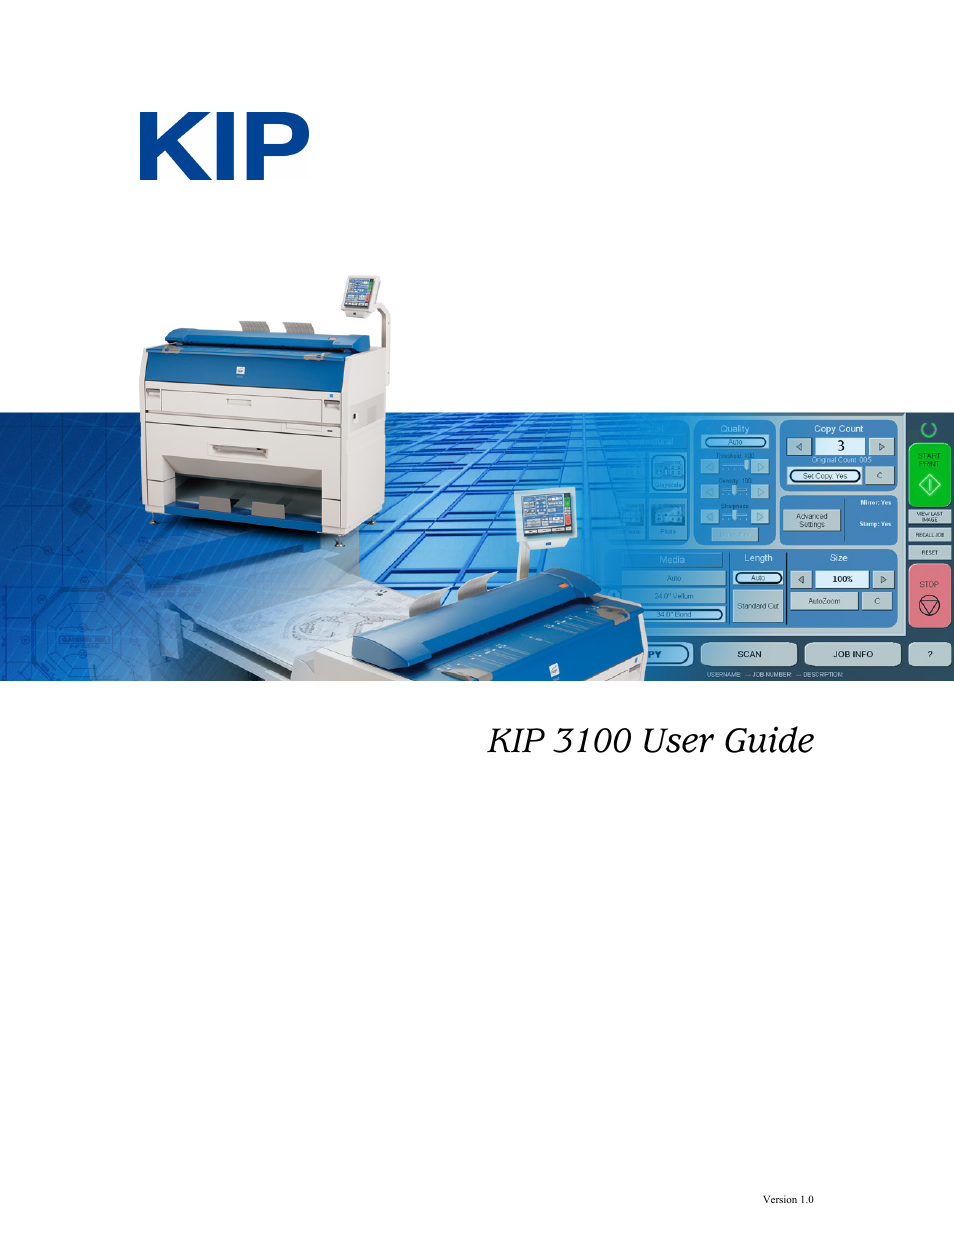 konica minolta kip 3100 user manual 56 pages rh manualsdir com